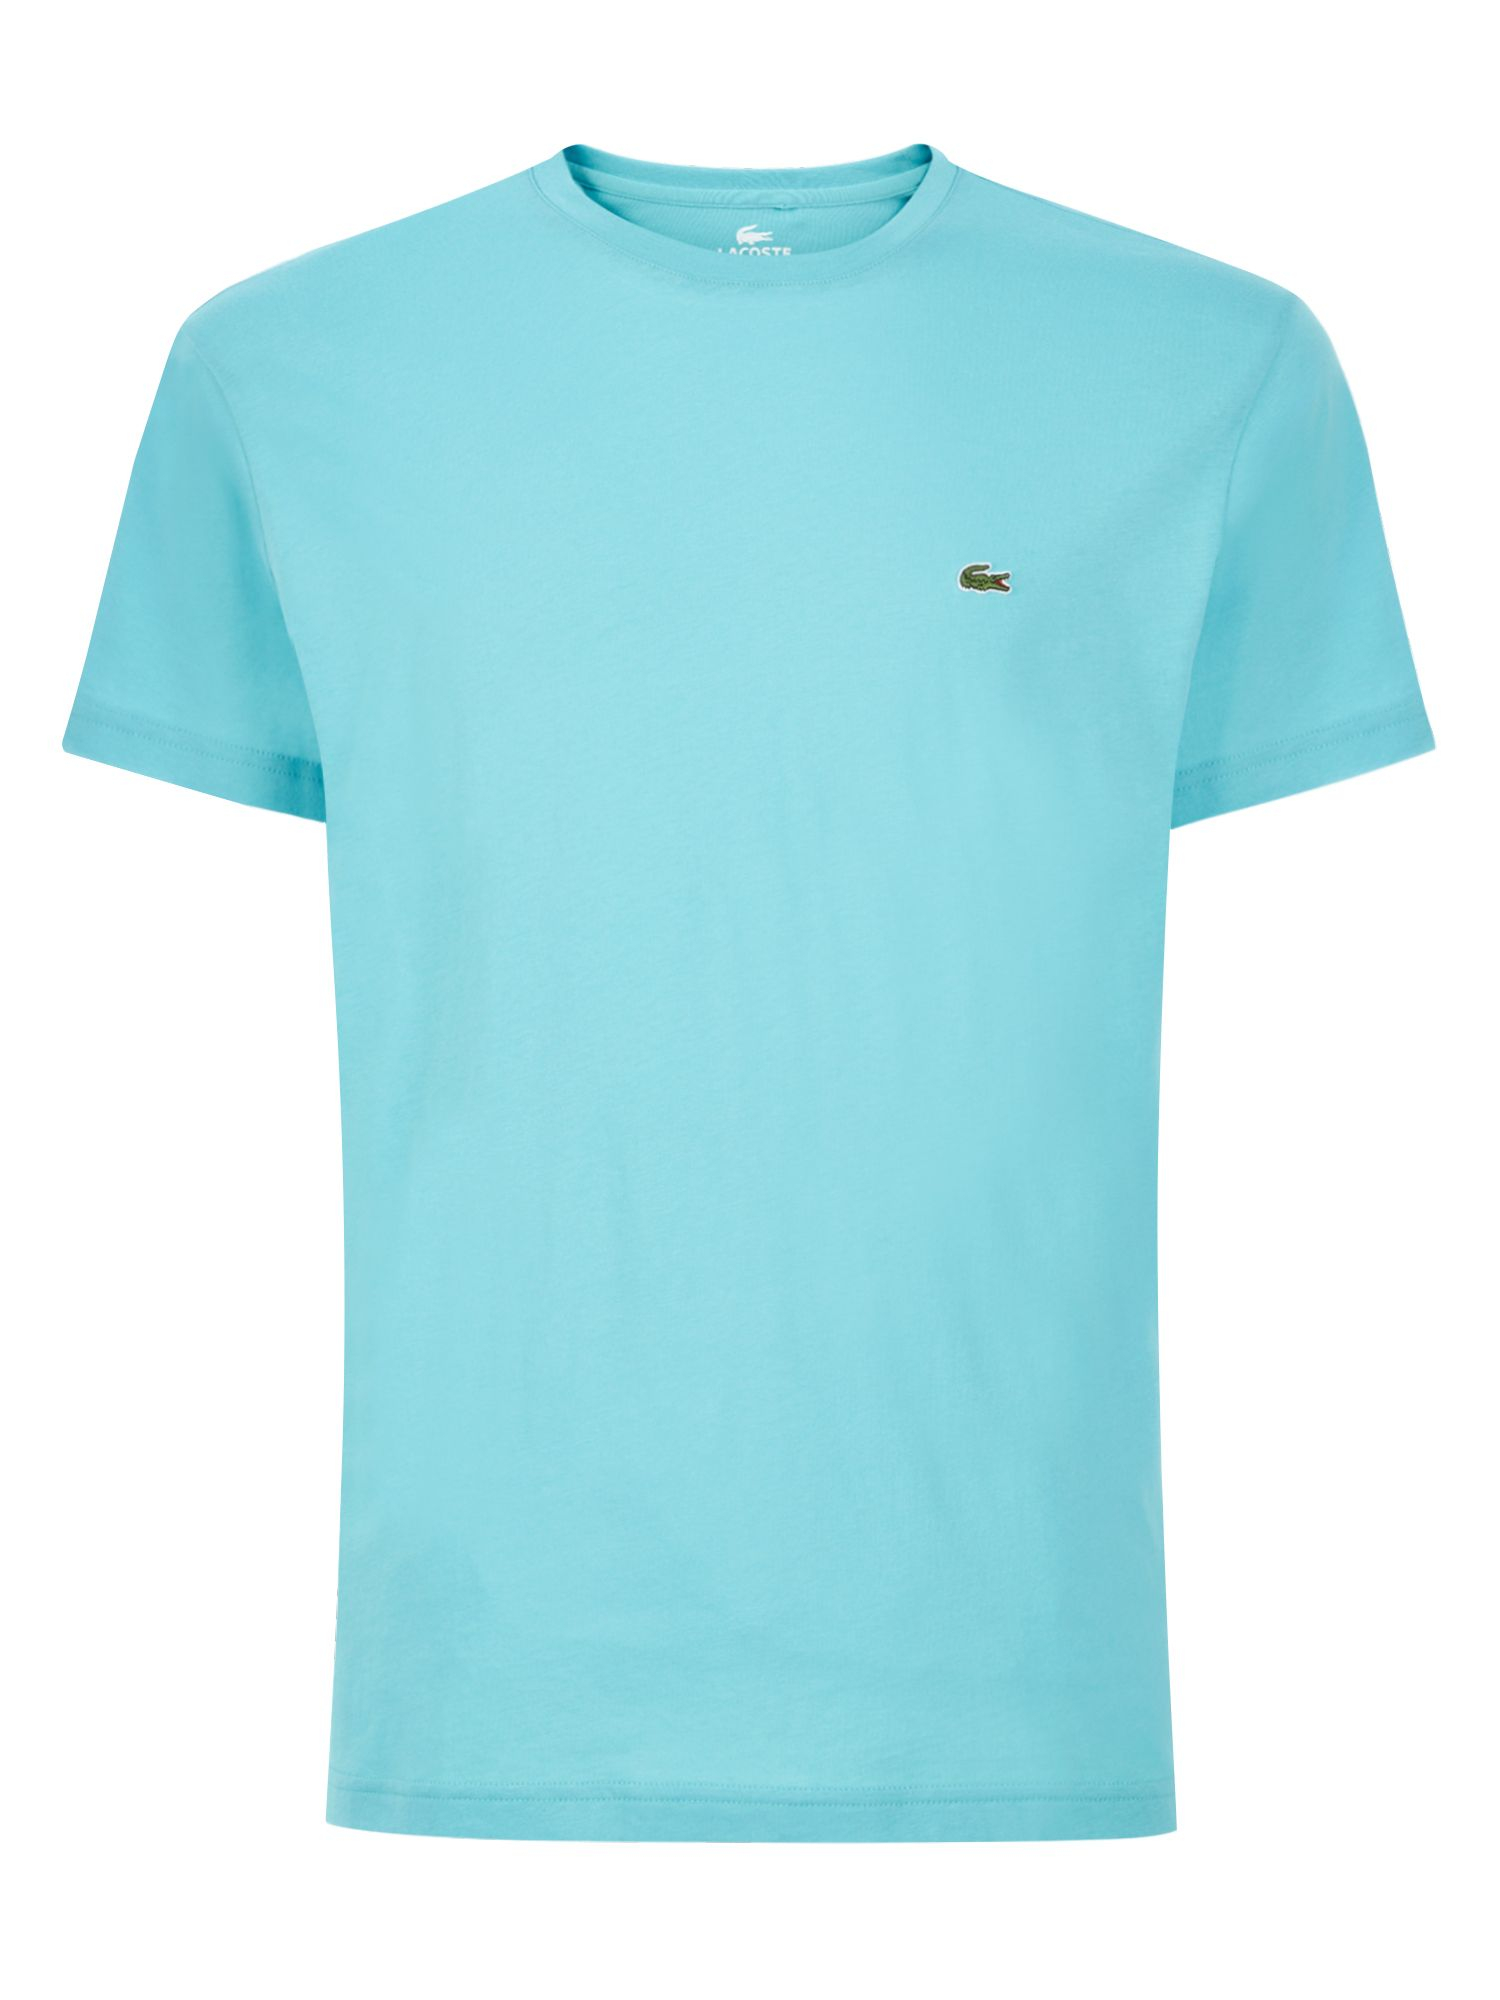 The gallery for muji logo for Aqua blue color t shirt